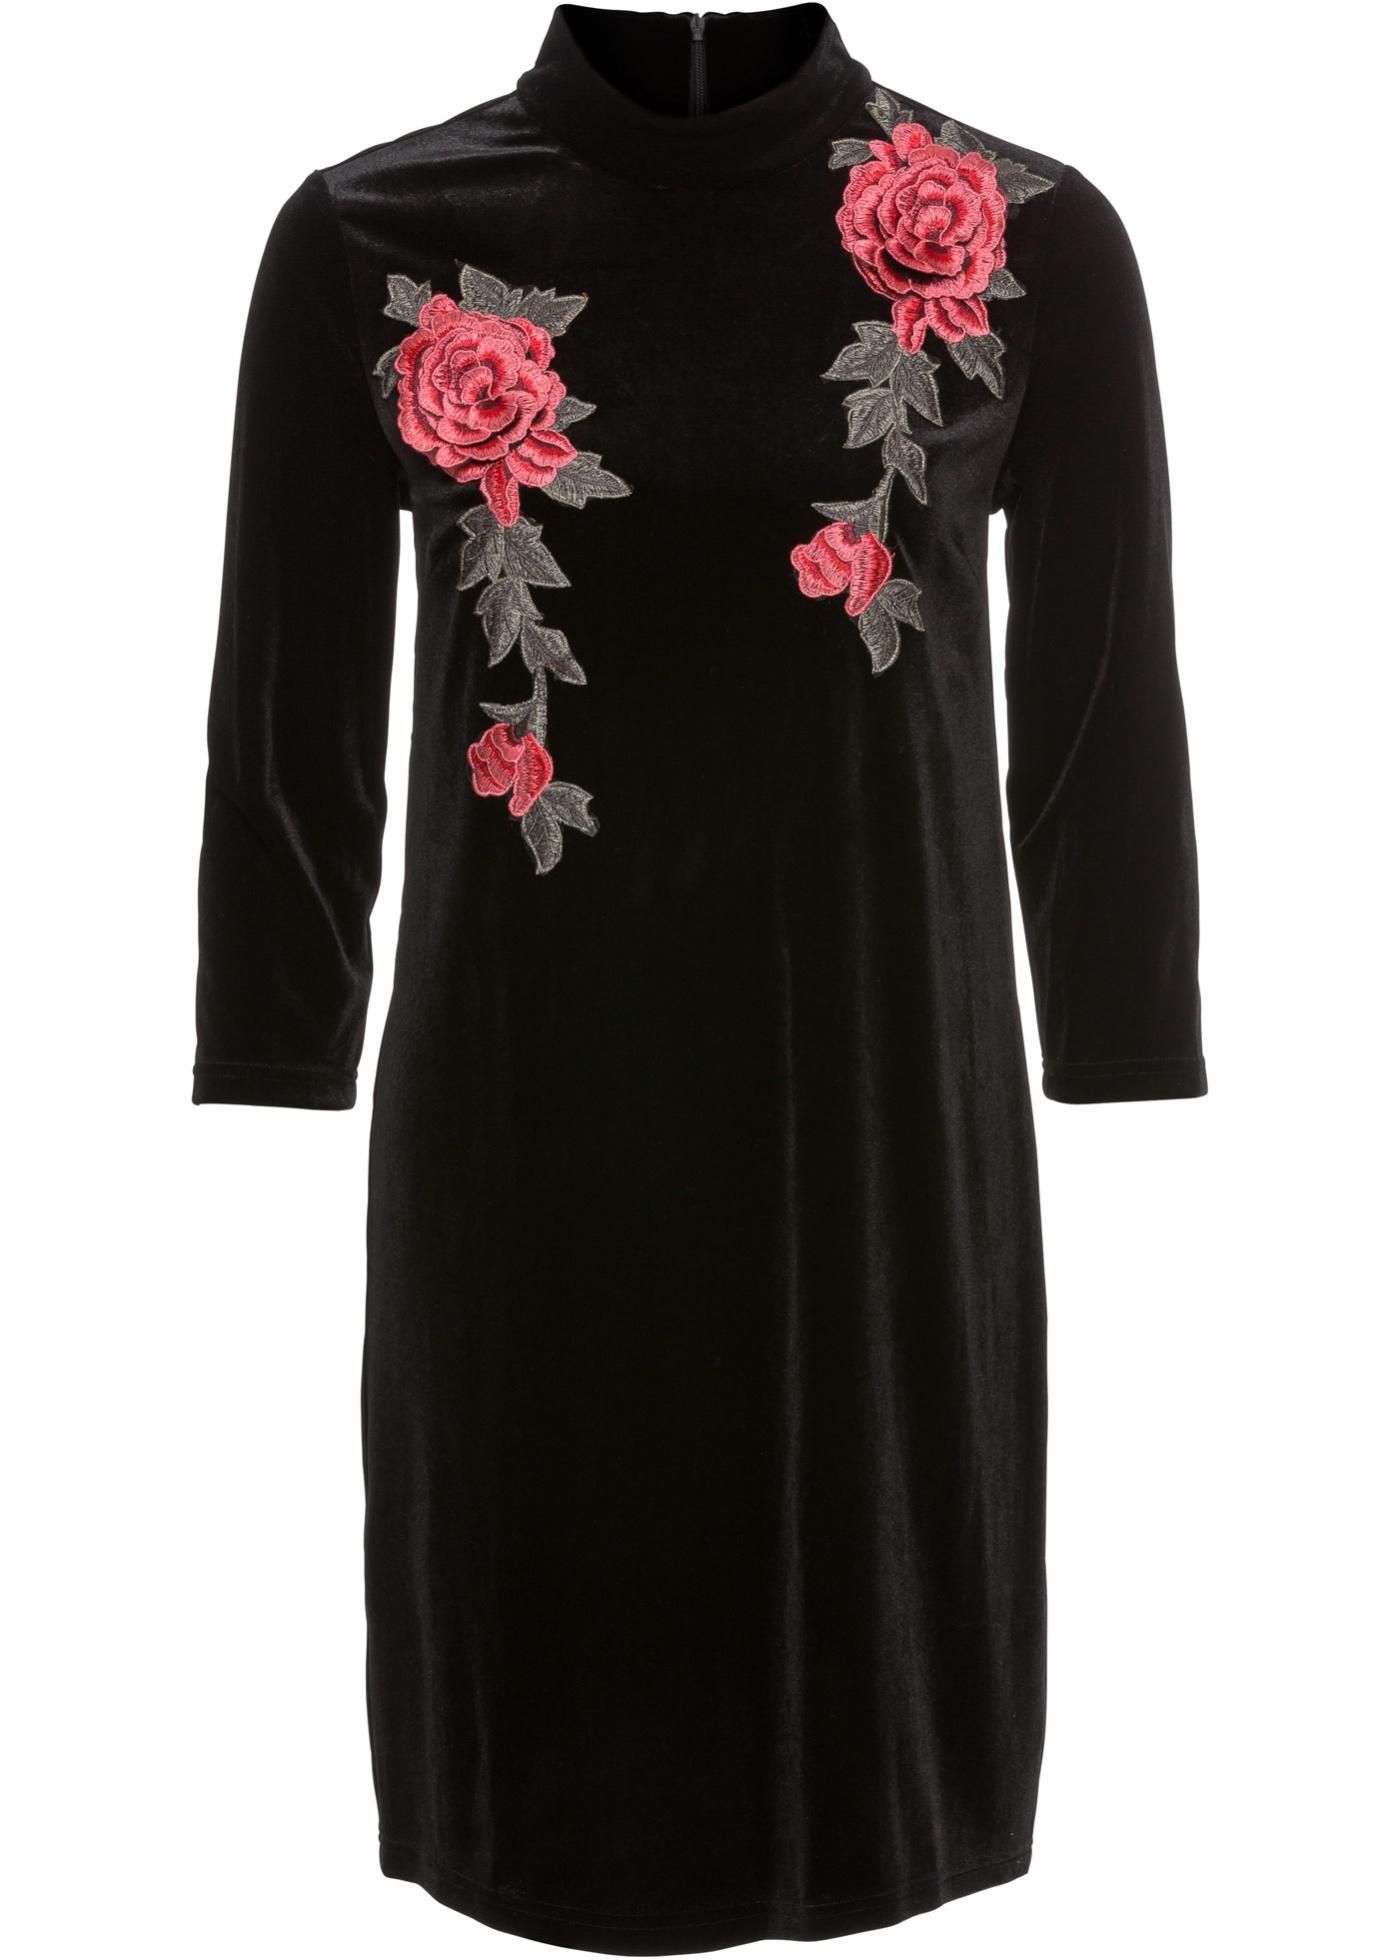 ba5a00cf9bf Bonprix Bonprix Damen Jersey-Kleid aus Samt mit Stickerei ...